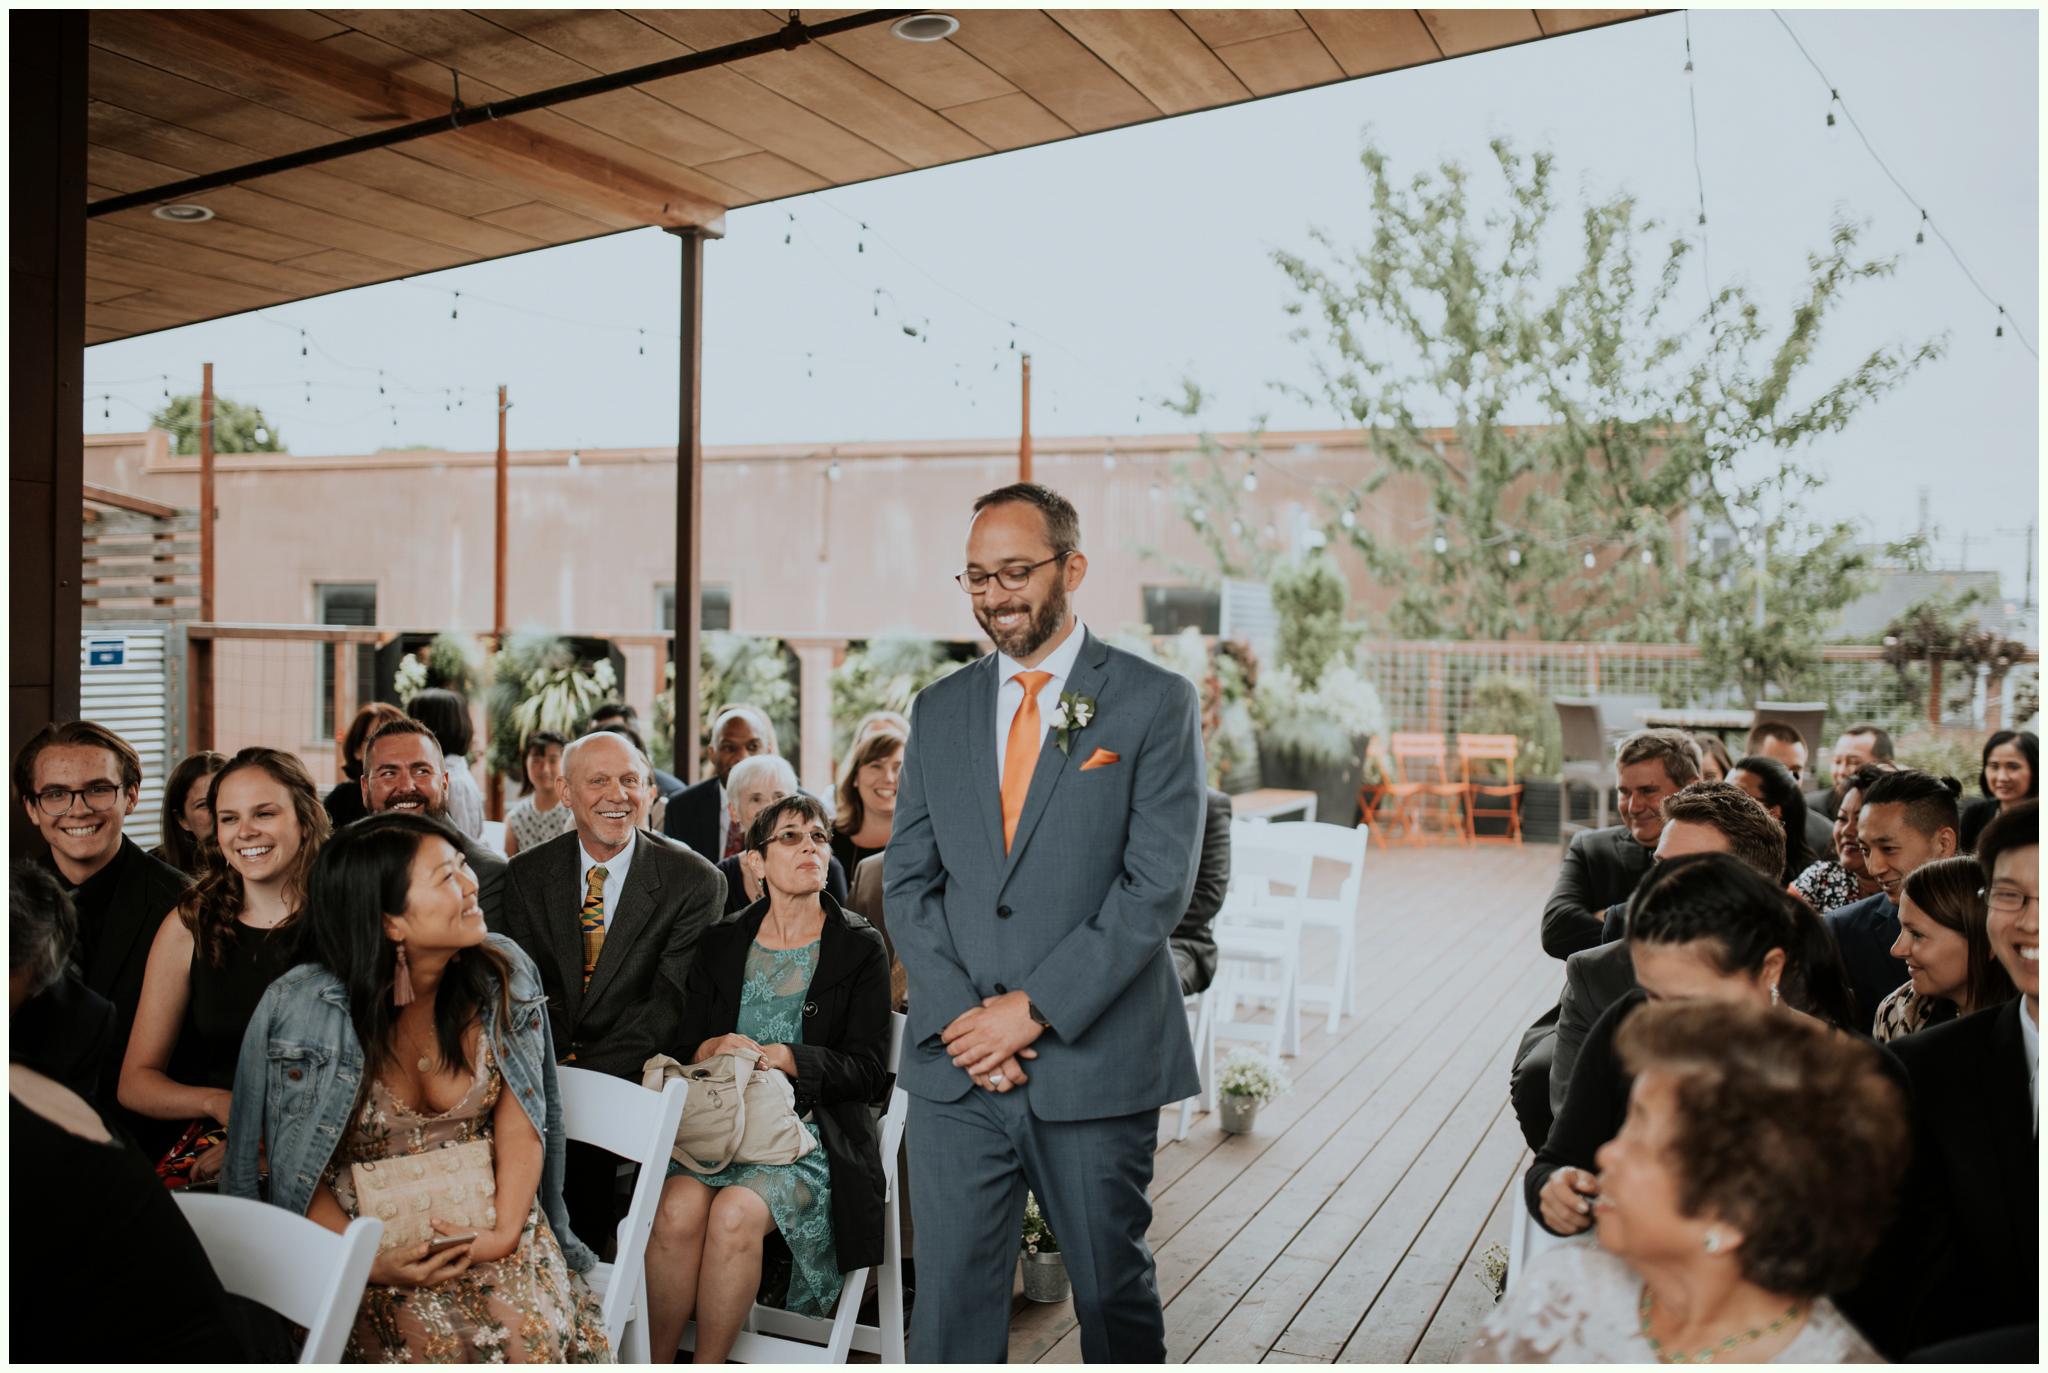 within-sodo-june-wedding-seattle-photographer-caitlyn-nikula-56.jpg